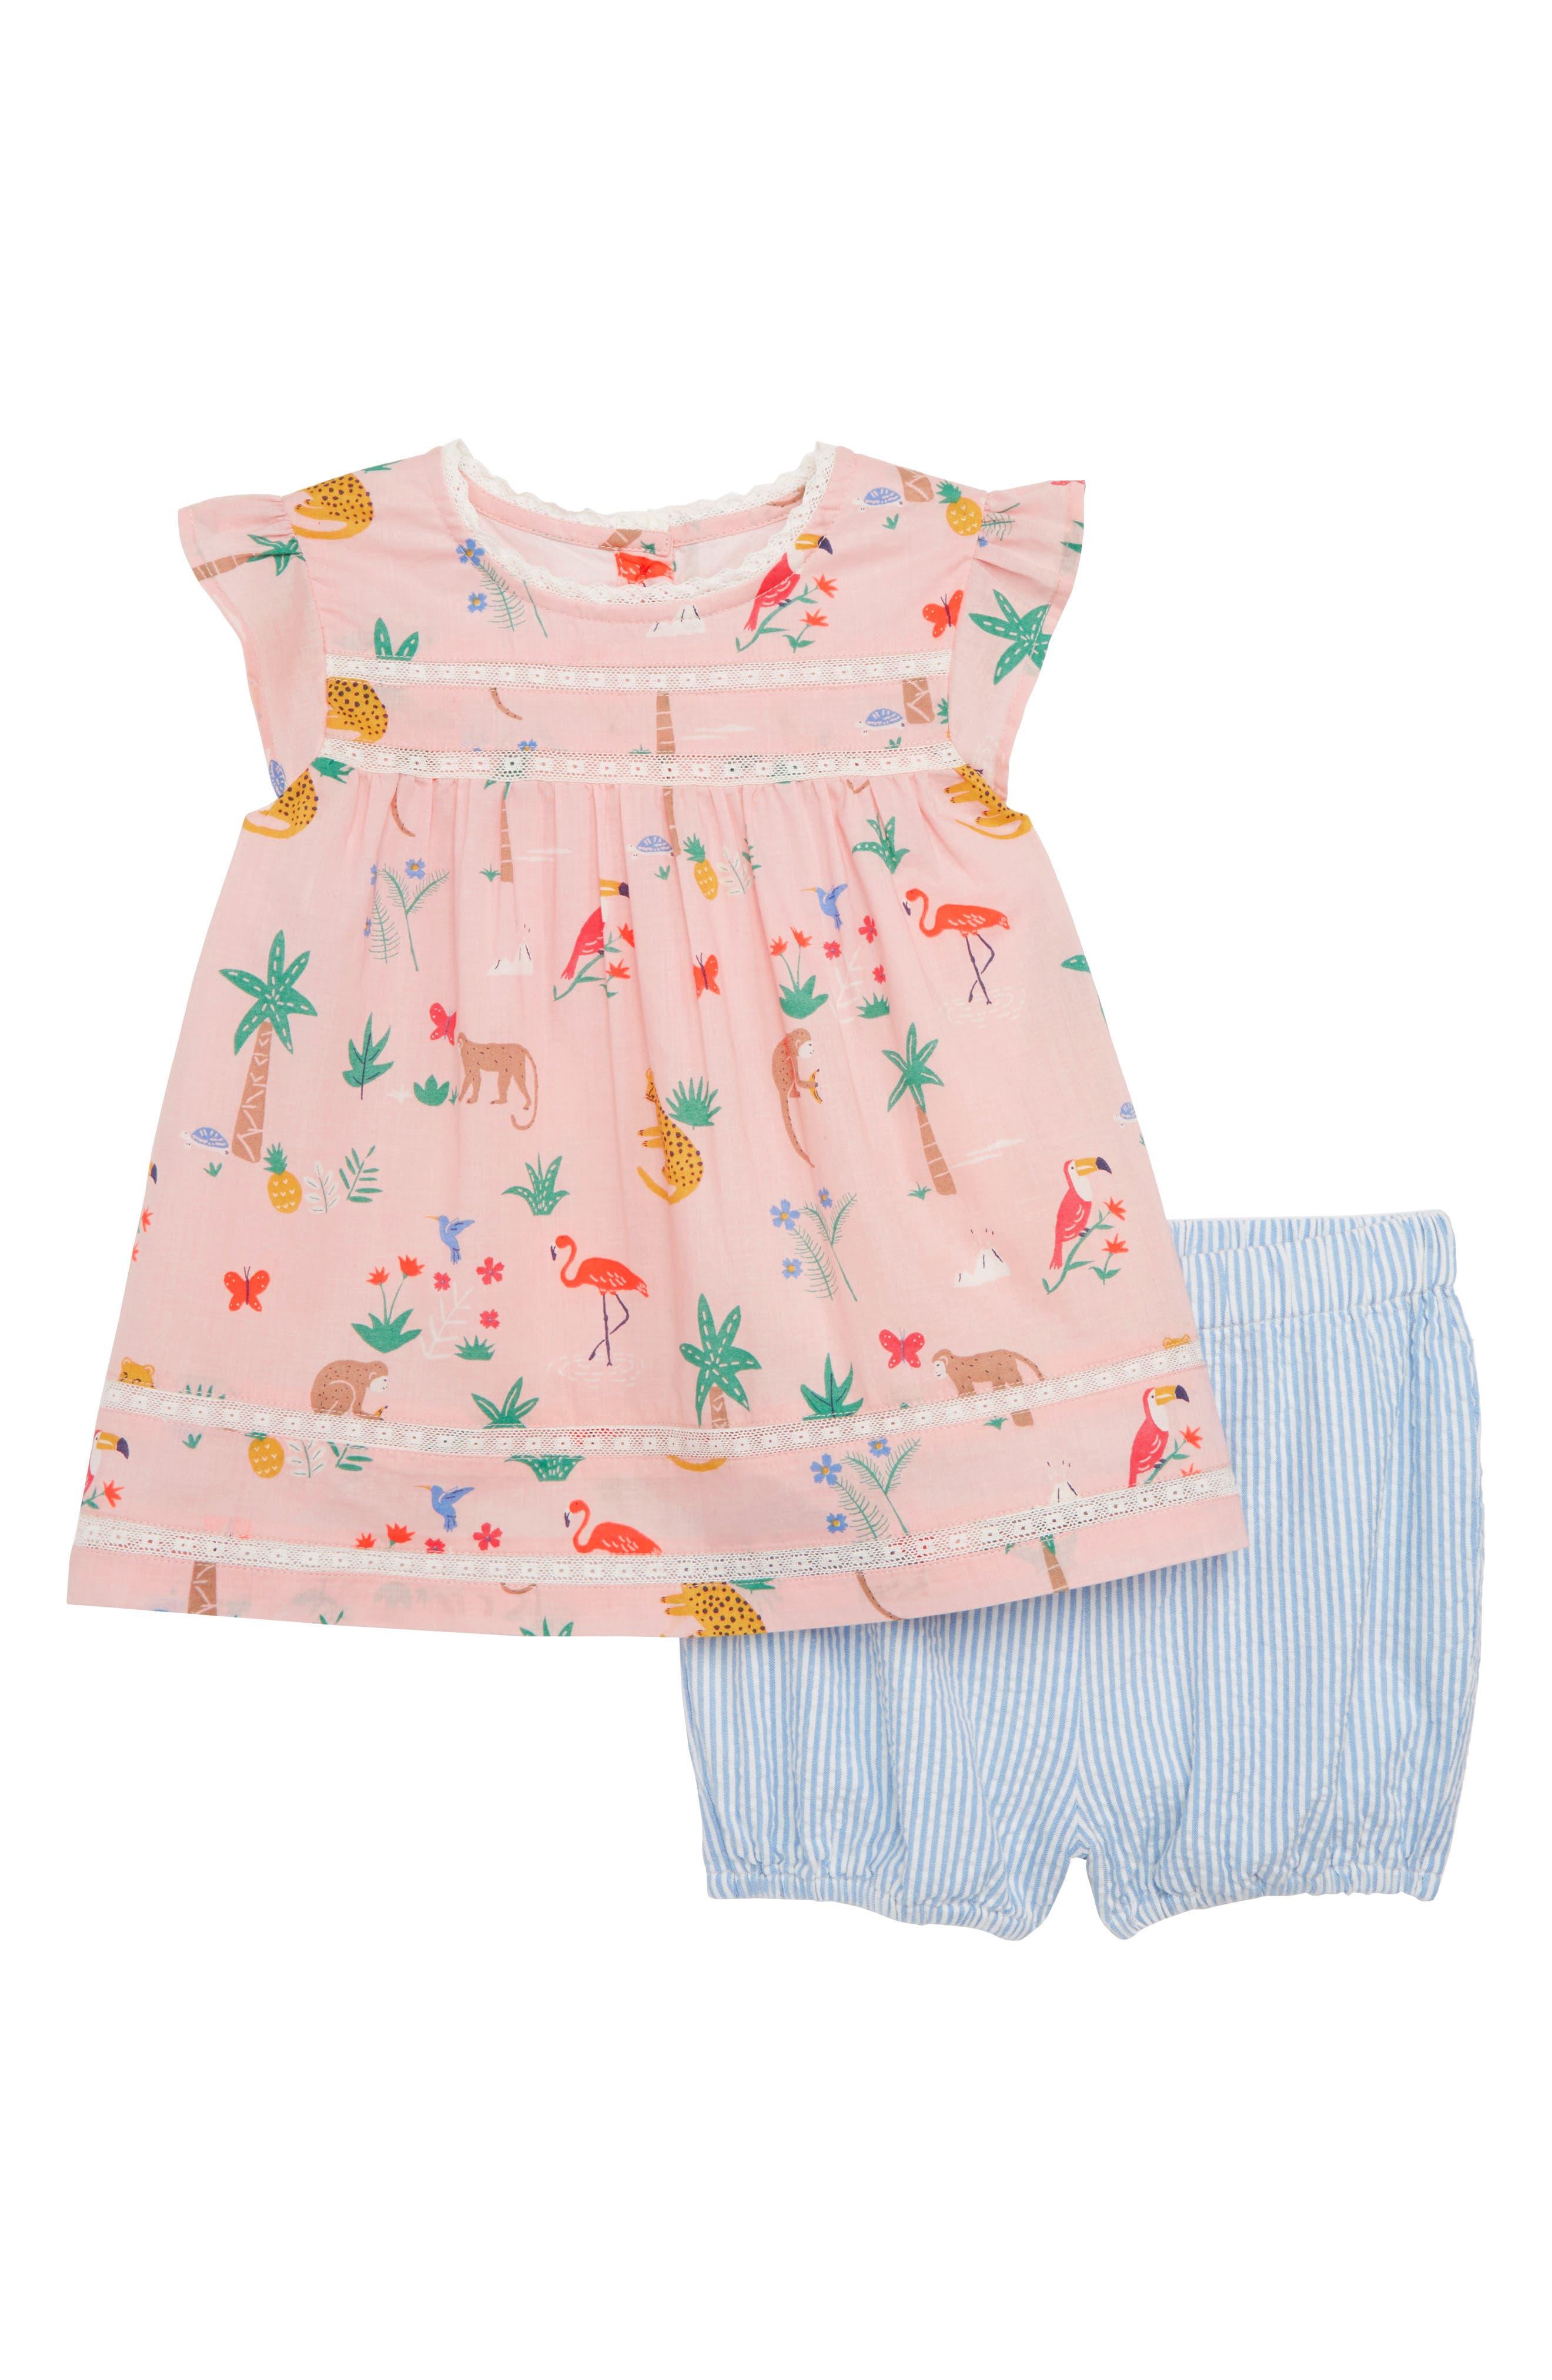 Sunny Days Top & Shorts Set,                         Main,                         color,